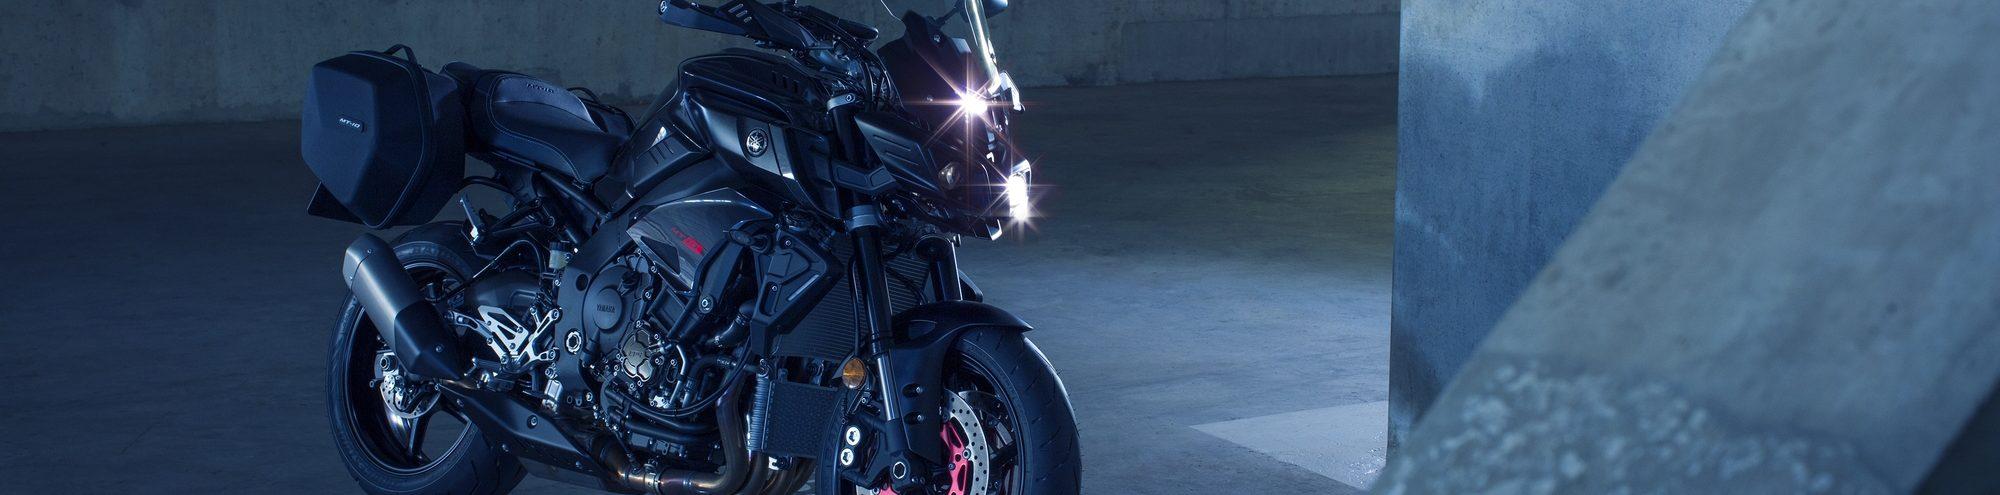 Yamaha MT-10 ABS Tourer Edition | MotorCentrumWest